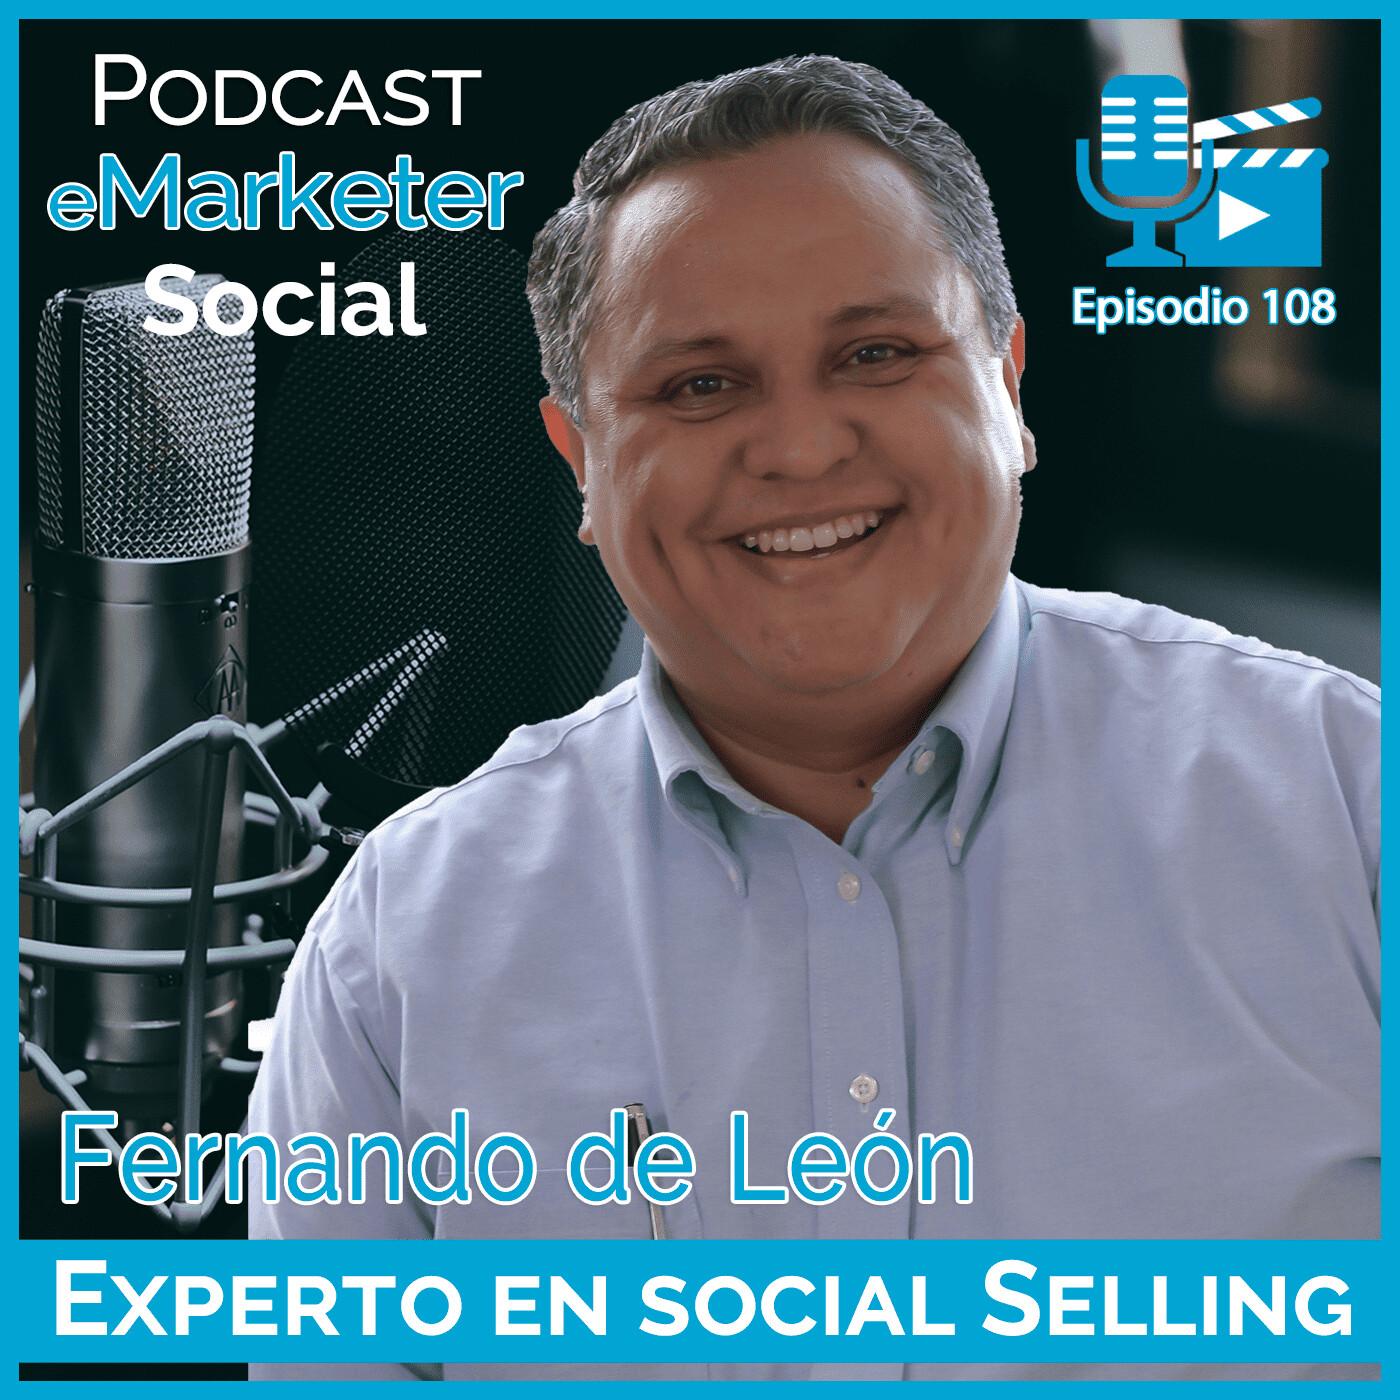 108 Fernando de León Estrada en Podcast eMarketerSocial